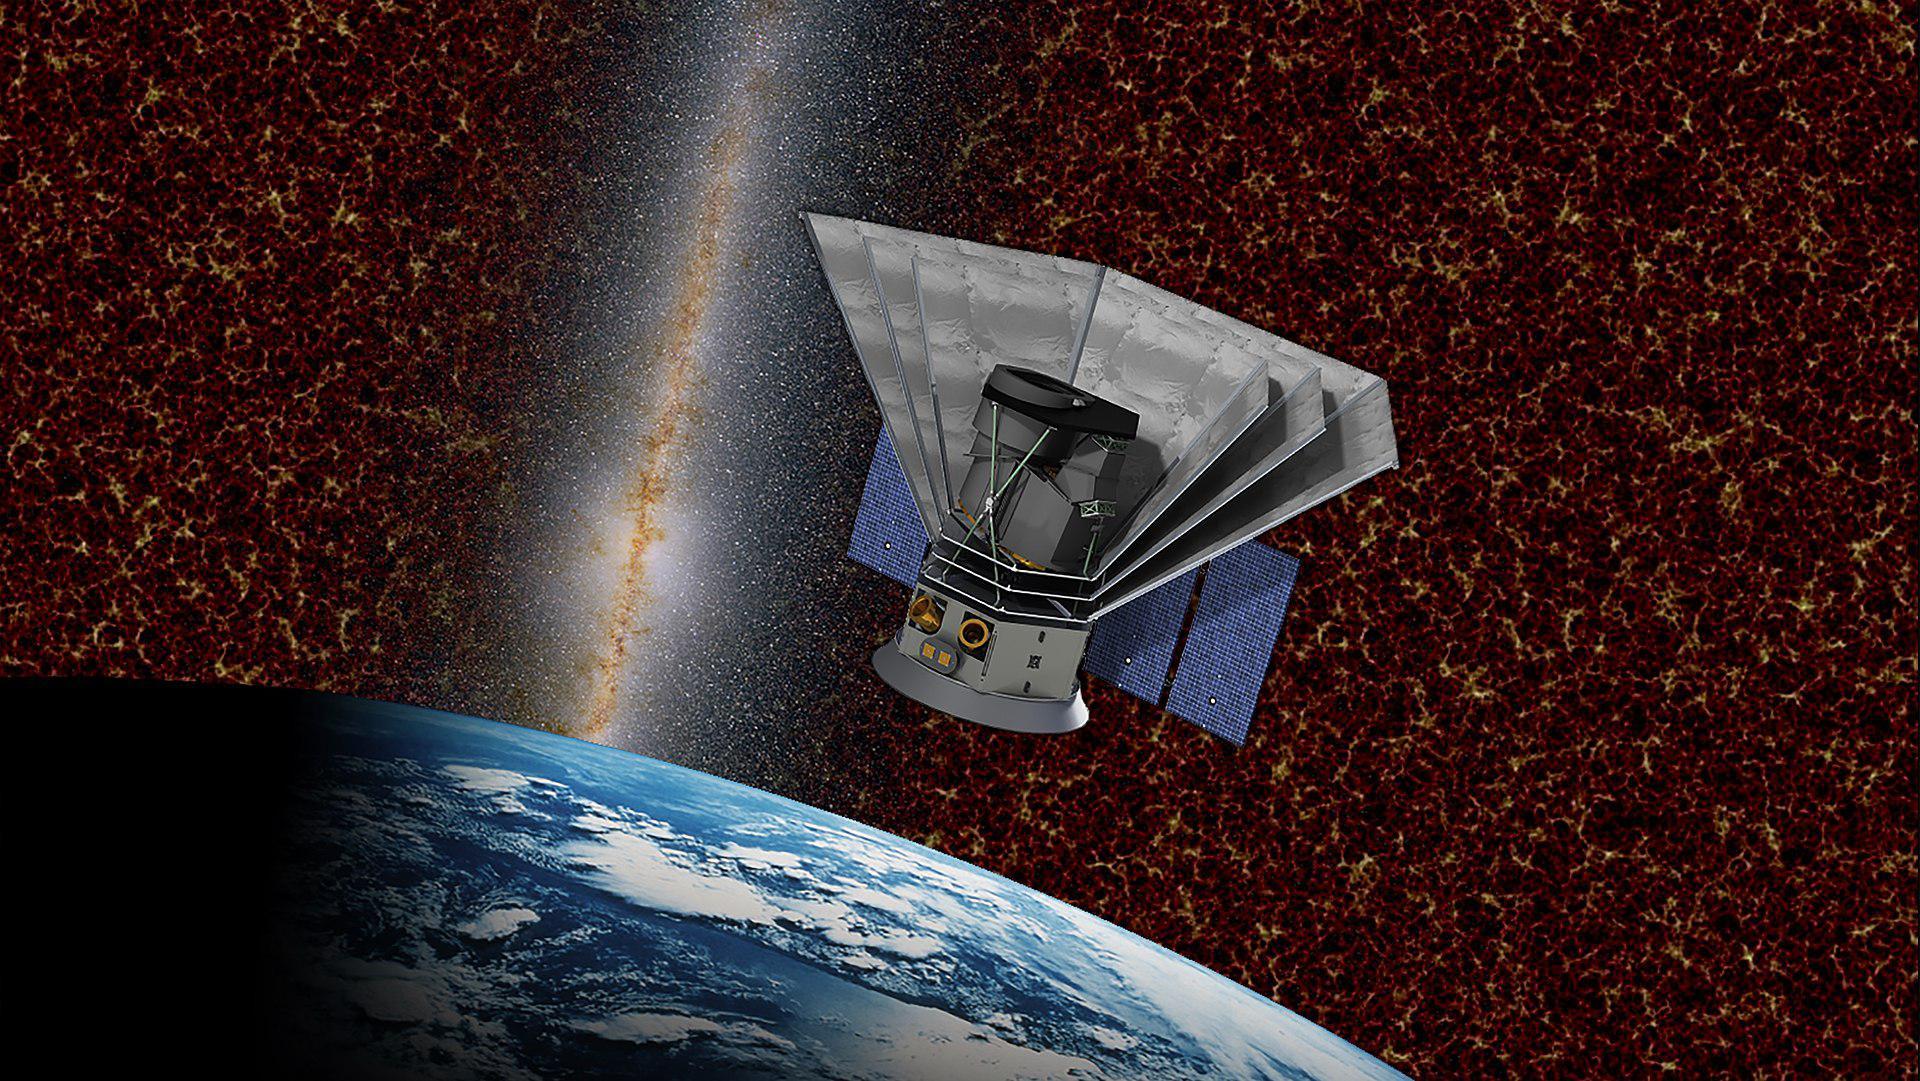 https://universemagazine.com/wp-content/uploads/2019/02/SPHEREx_Space_Observatory_NASA.jpg